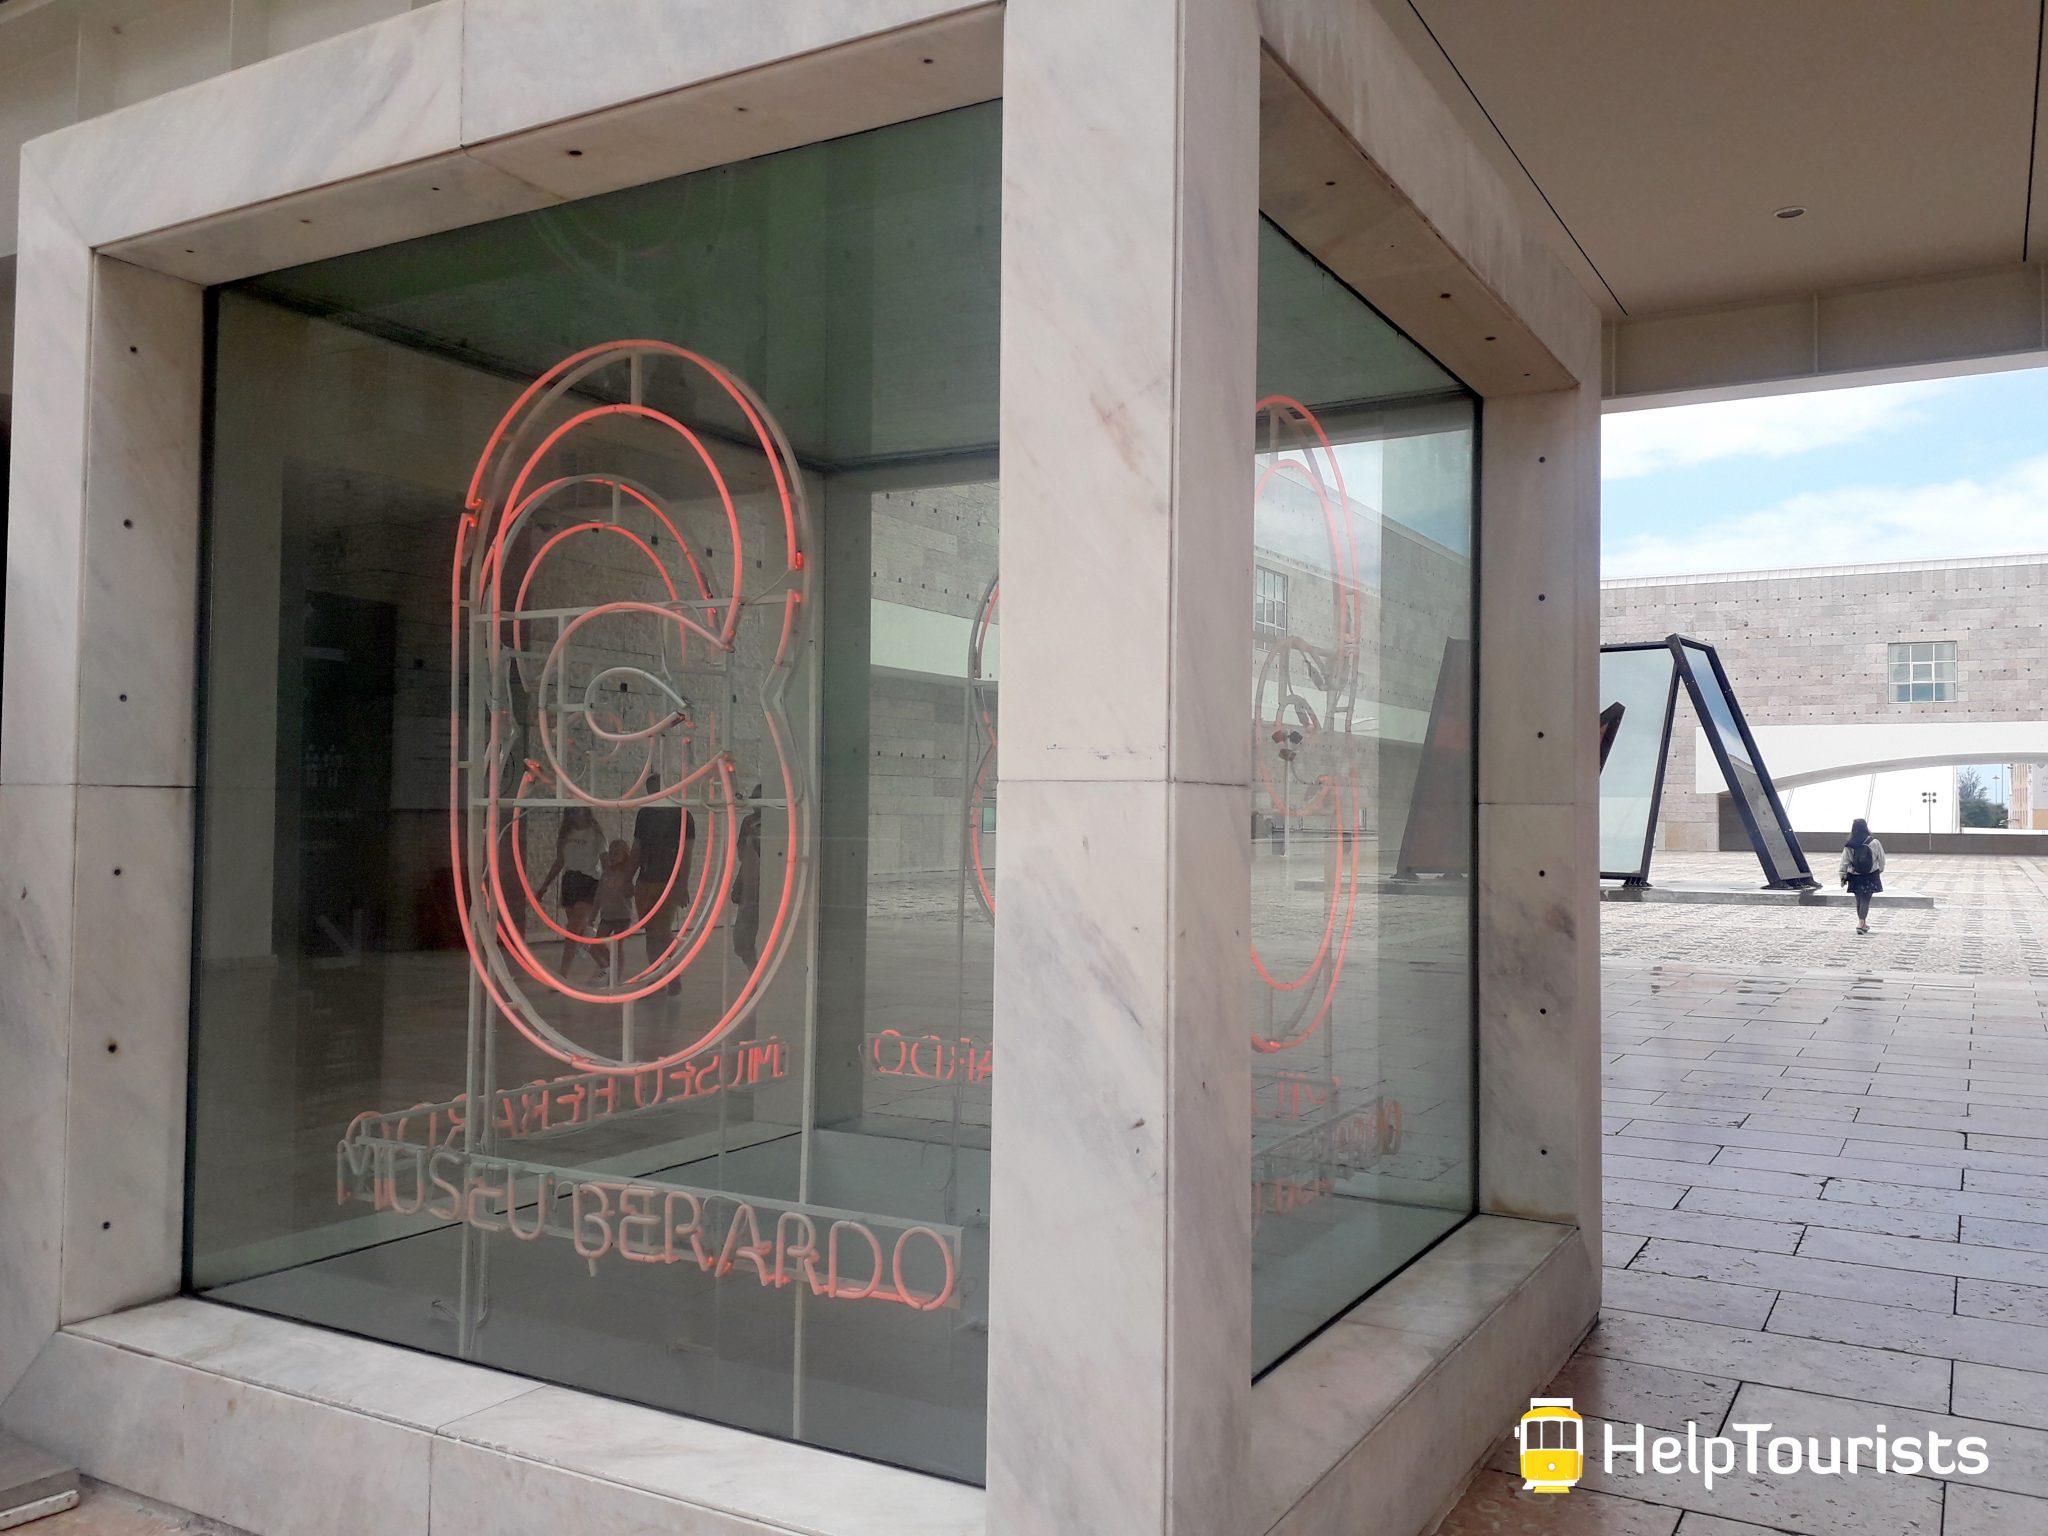 Lissabon Kulturzentrum berardo Belem